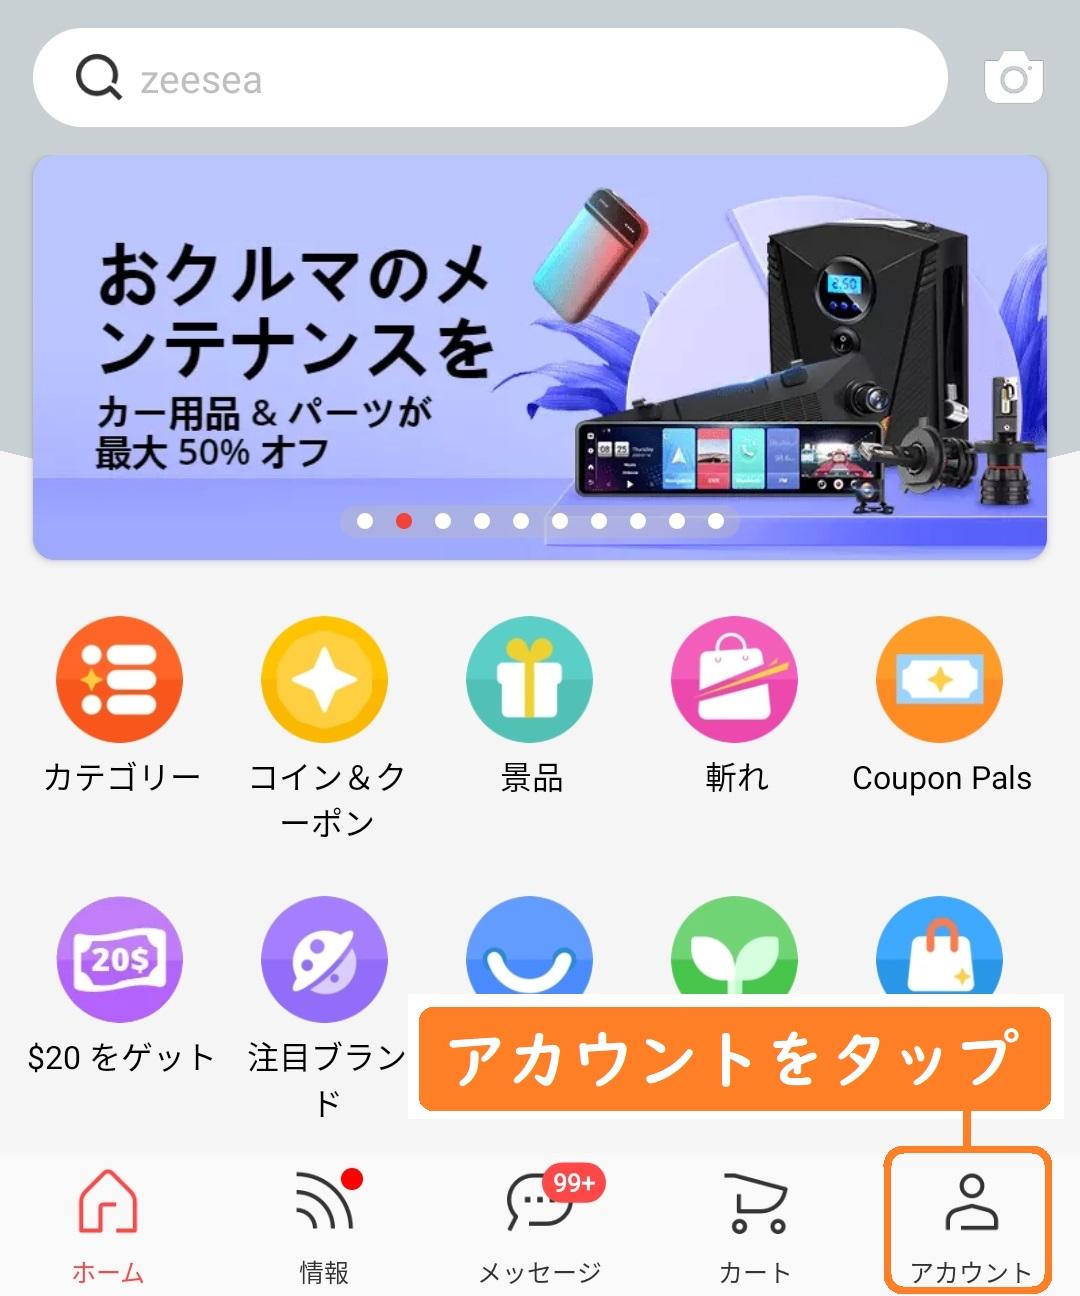 AliExpress アプリ ホーム画面